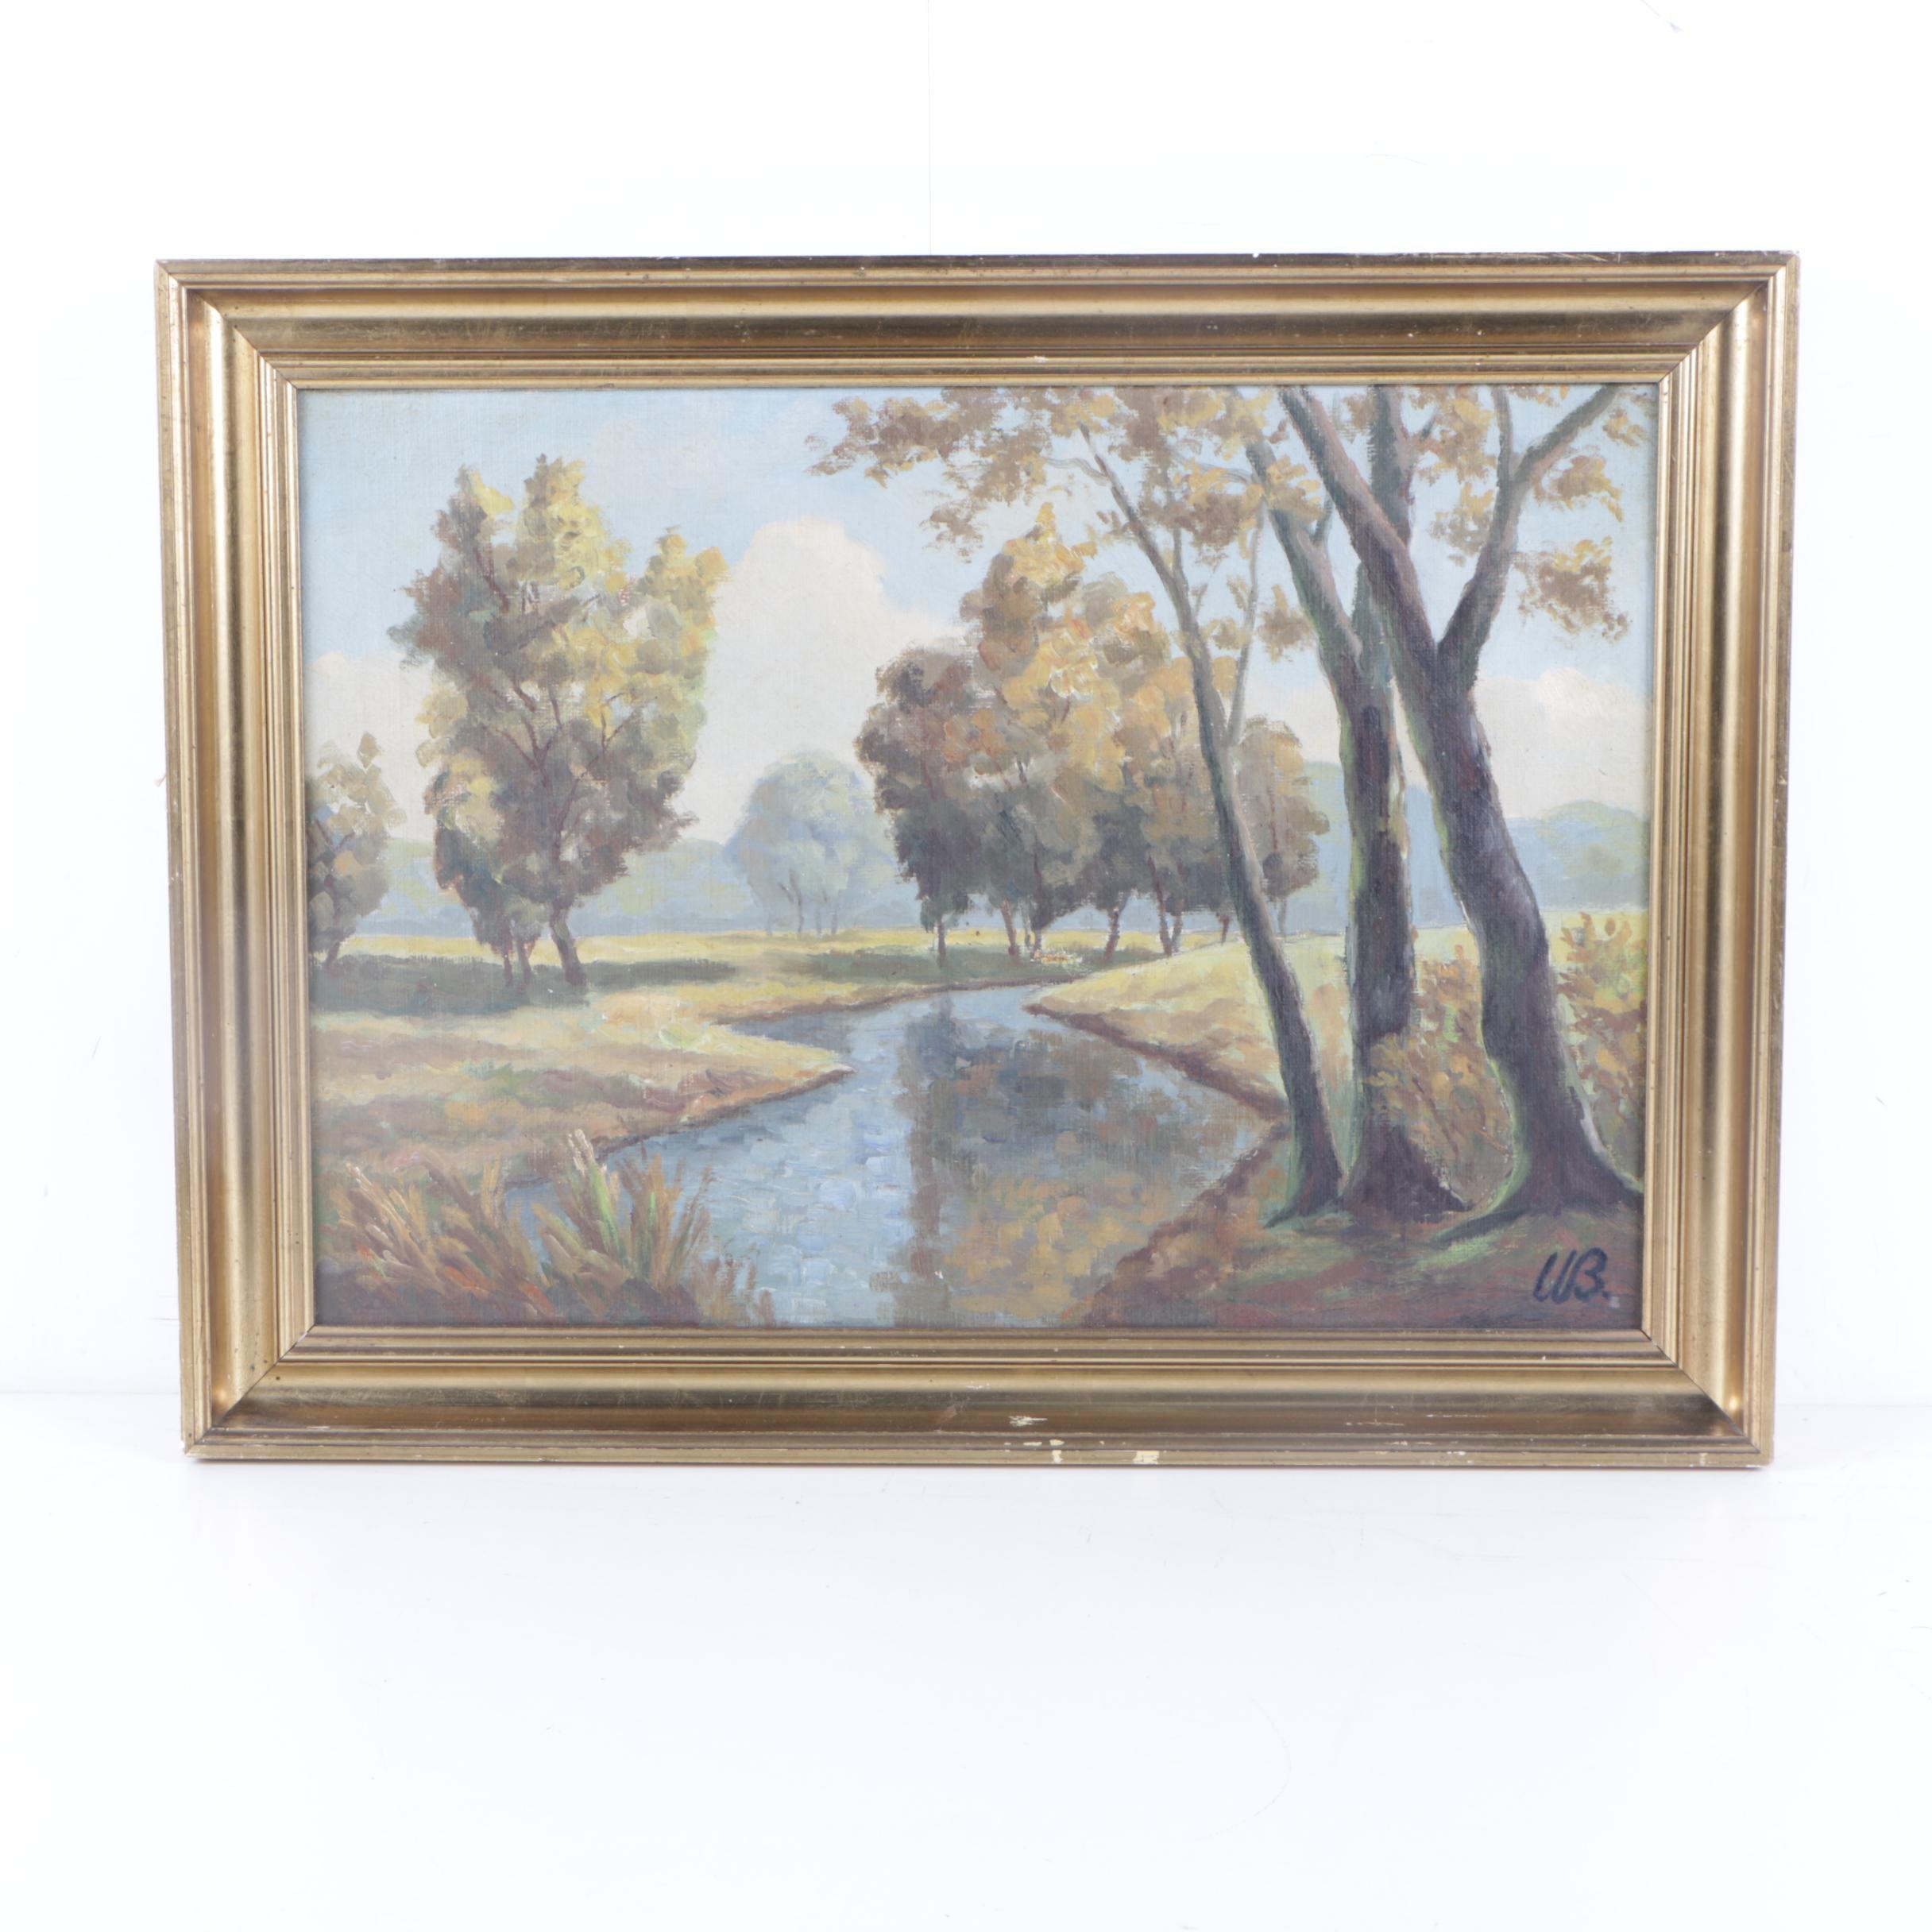 U.B. Oil Landscape Painting